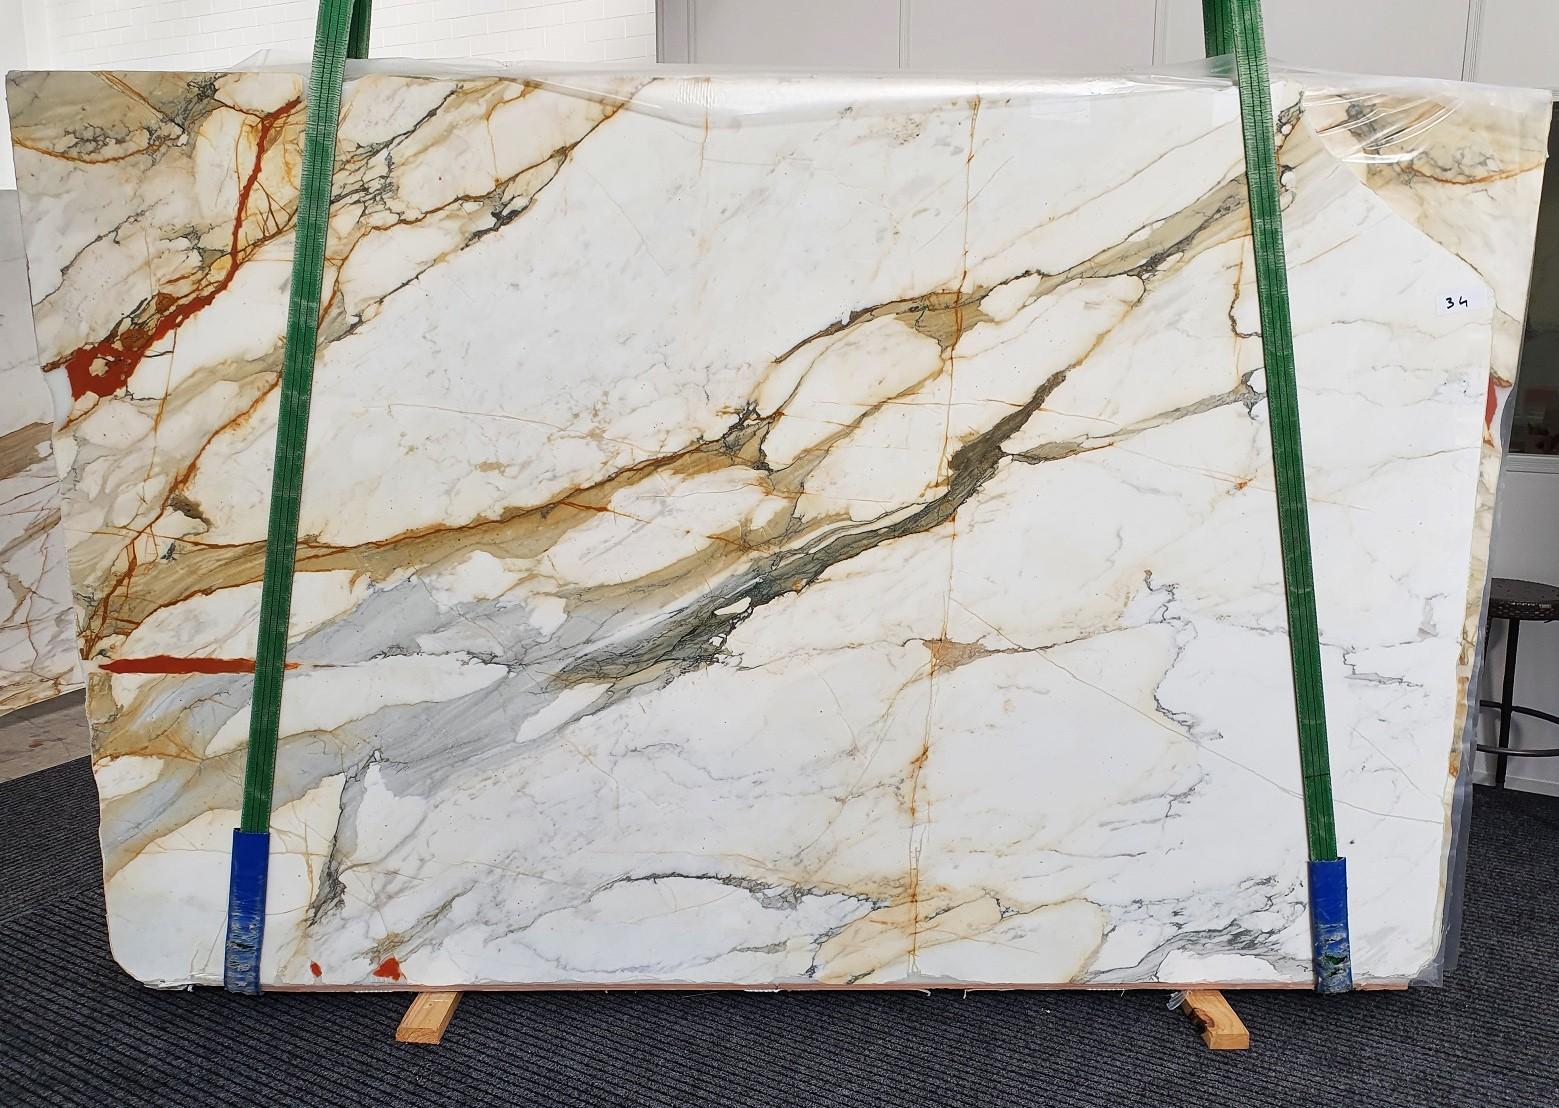 CALACATTA MACCHIAVECCHIA Supply Veneto (Italy) polished slabs 1422 , Slab #34 natural marble